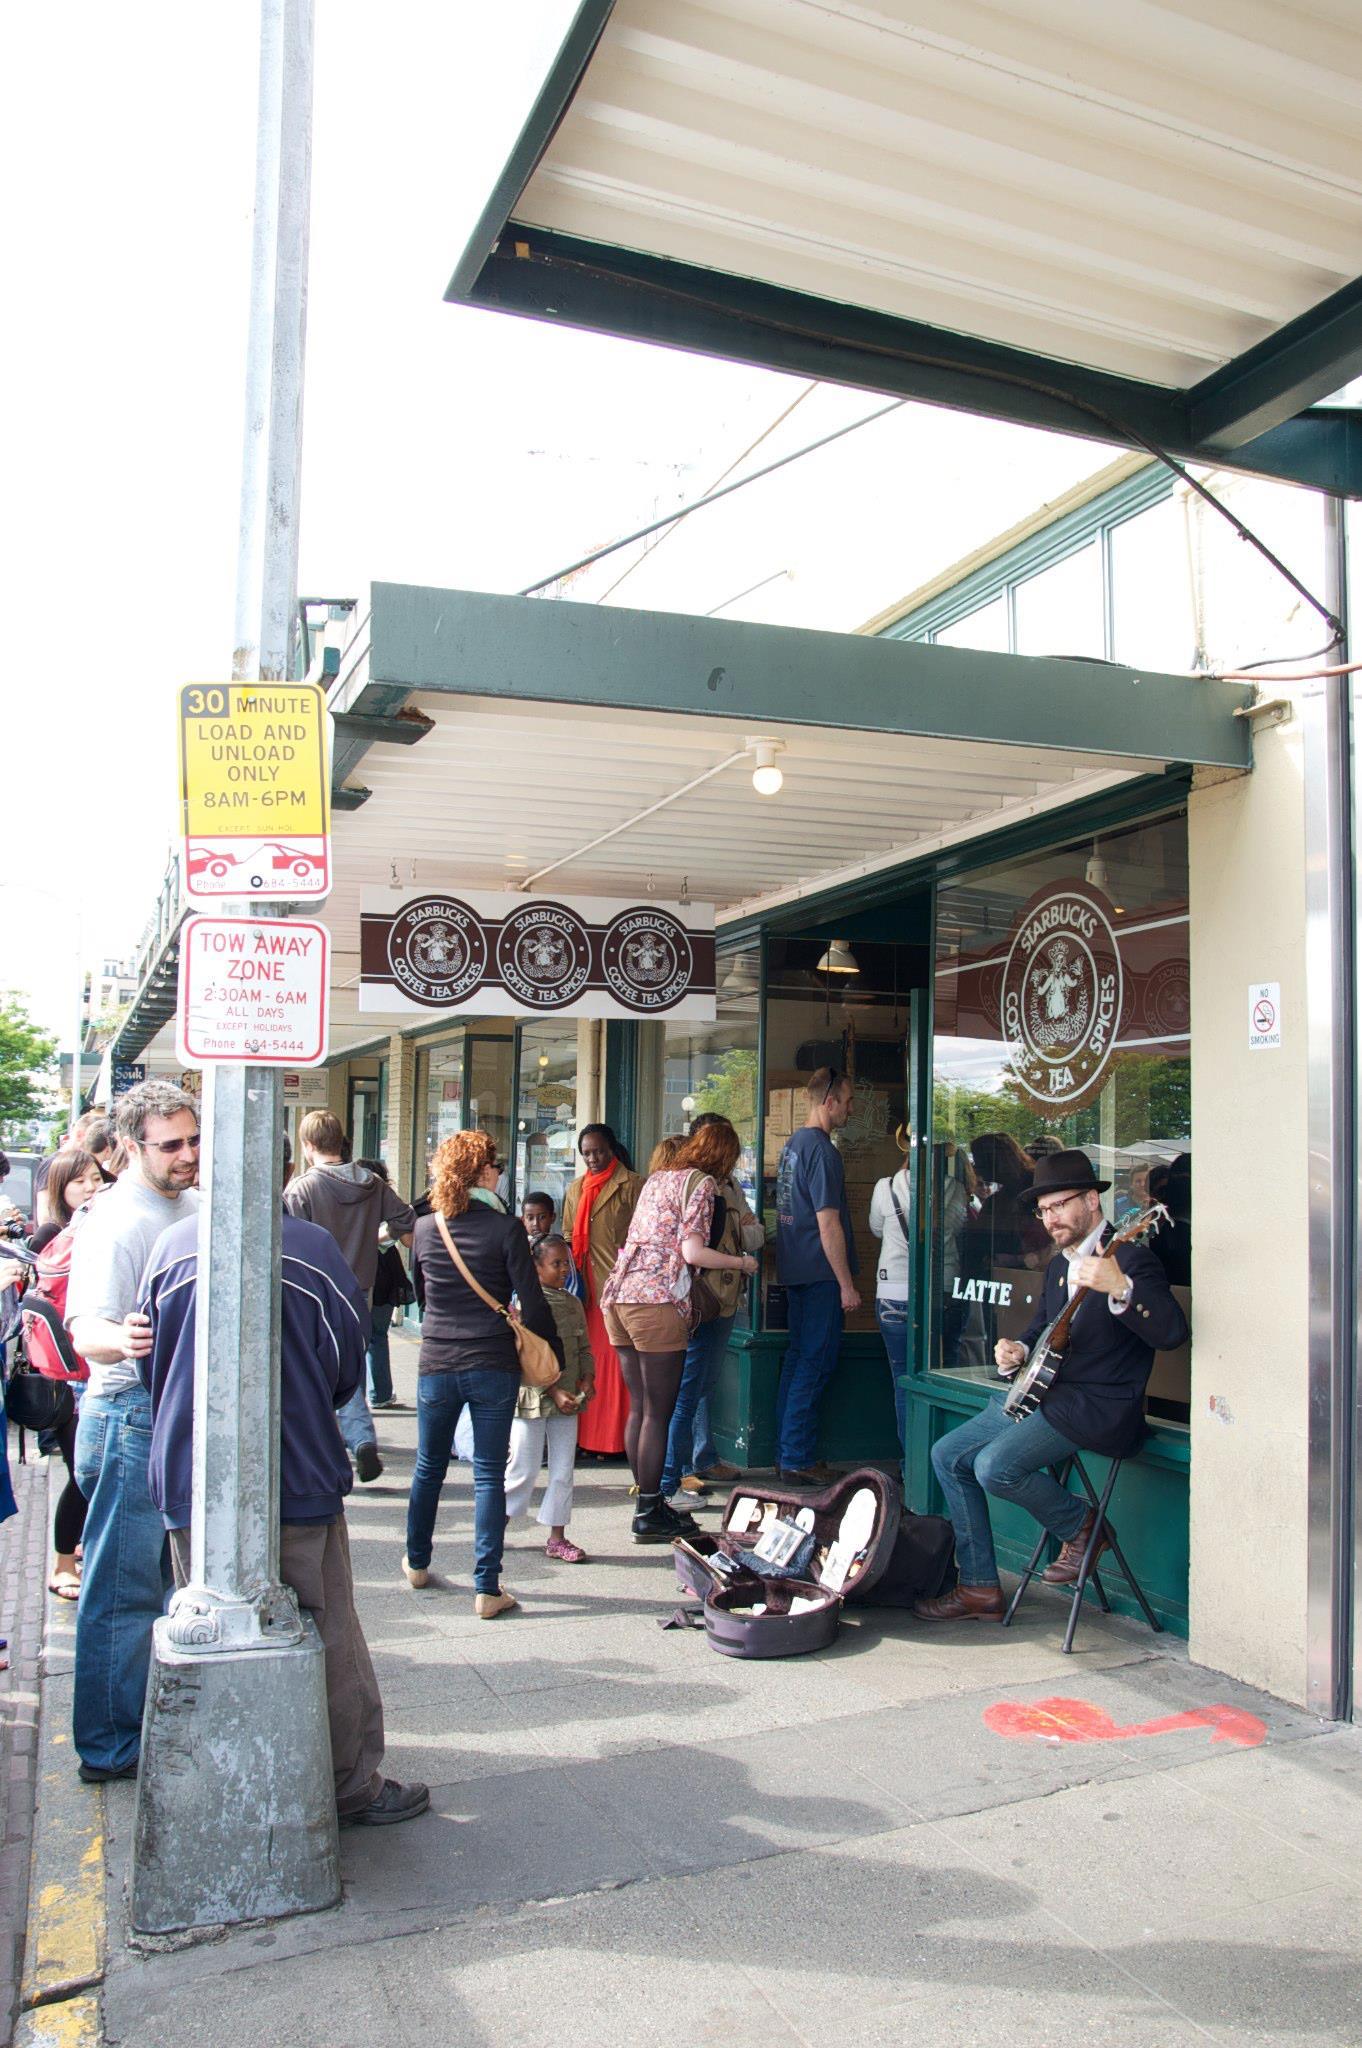 First Starbucks Location - Savannah Page